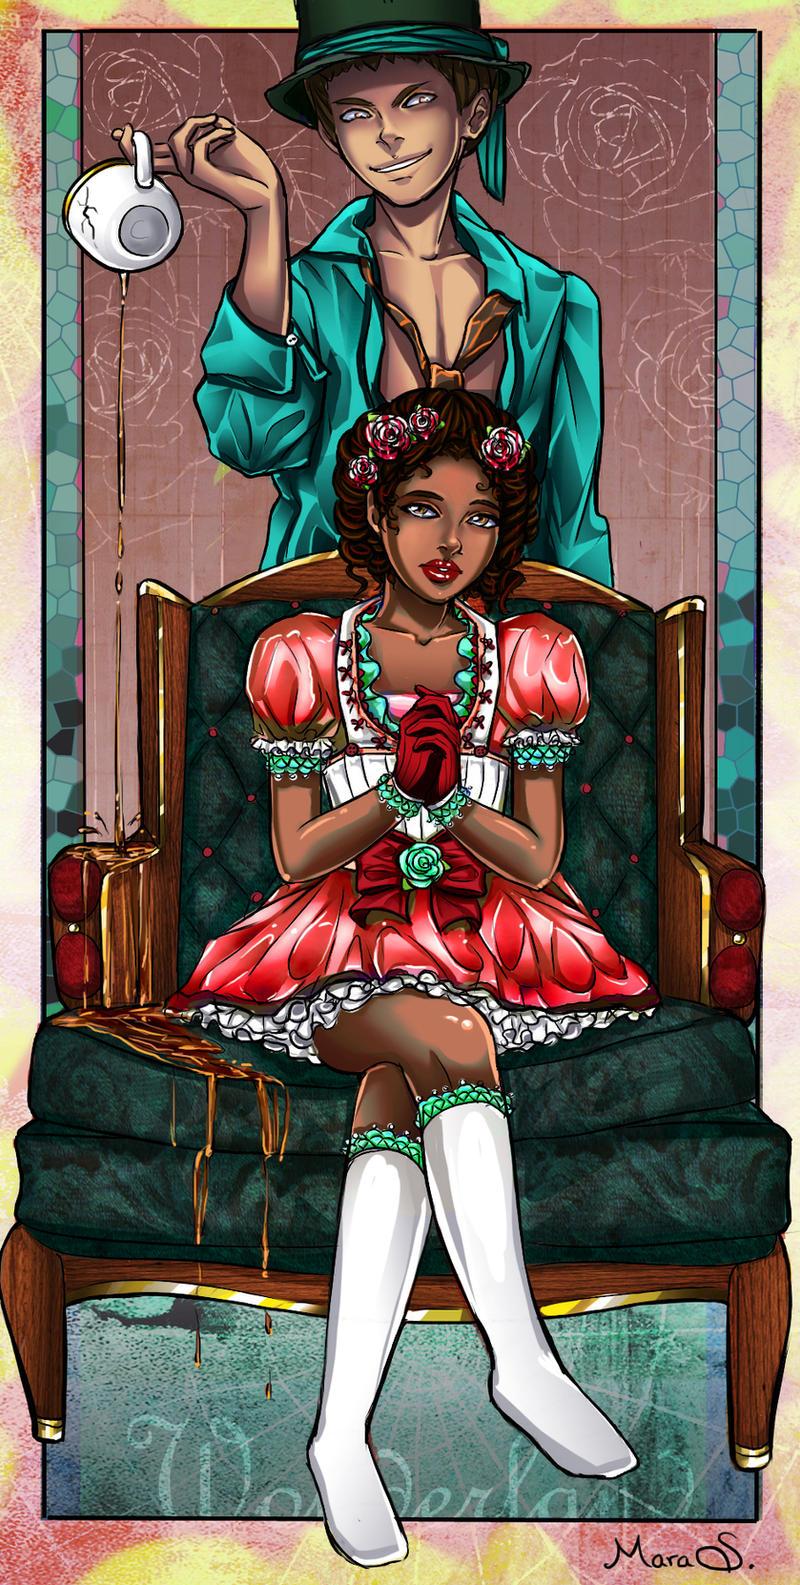 Libby in Wonderland by Acaciathorn